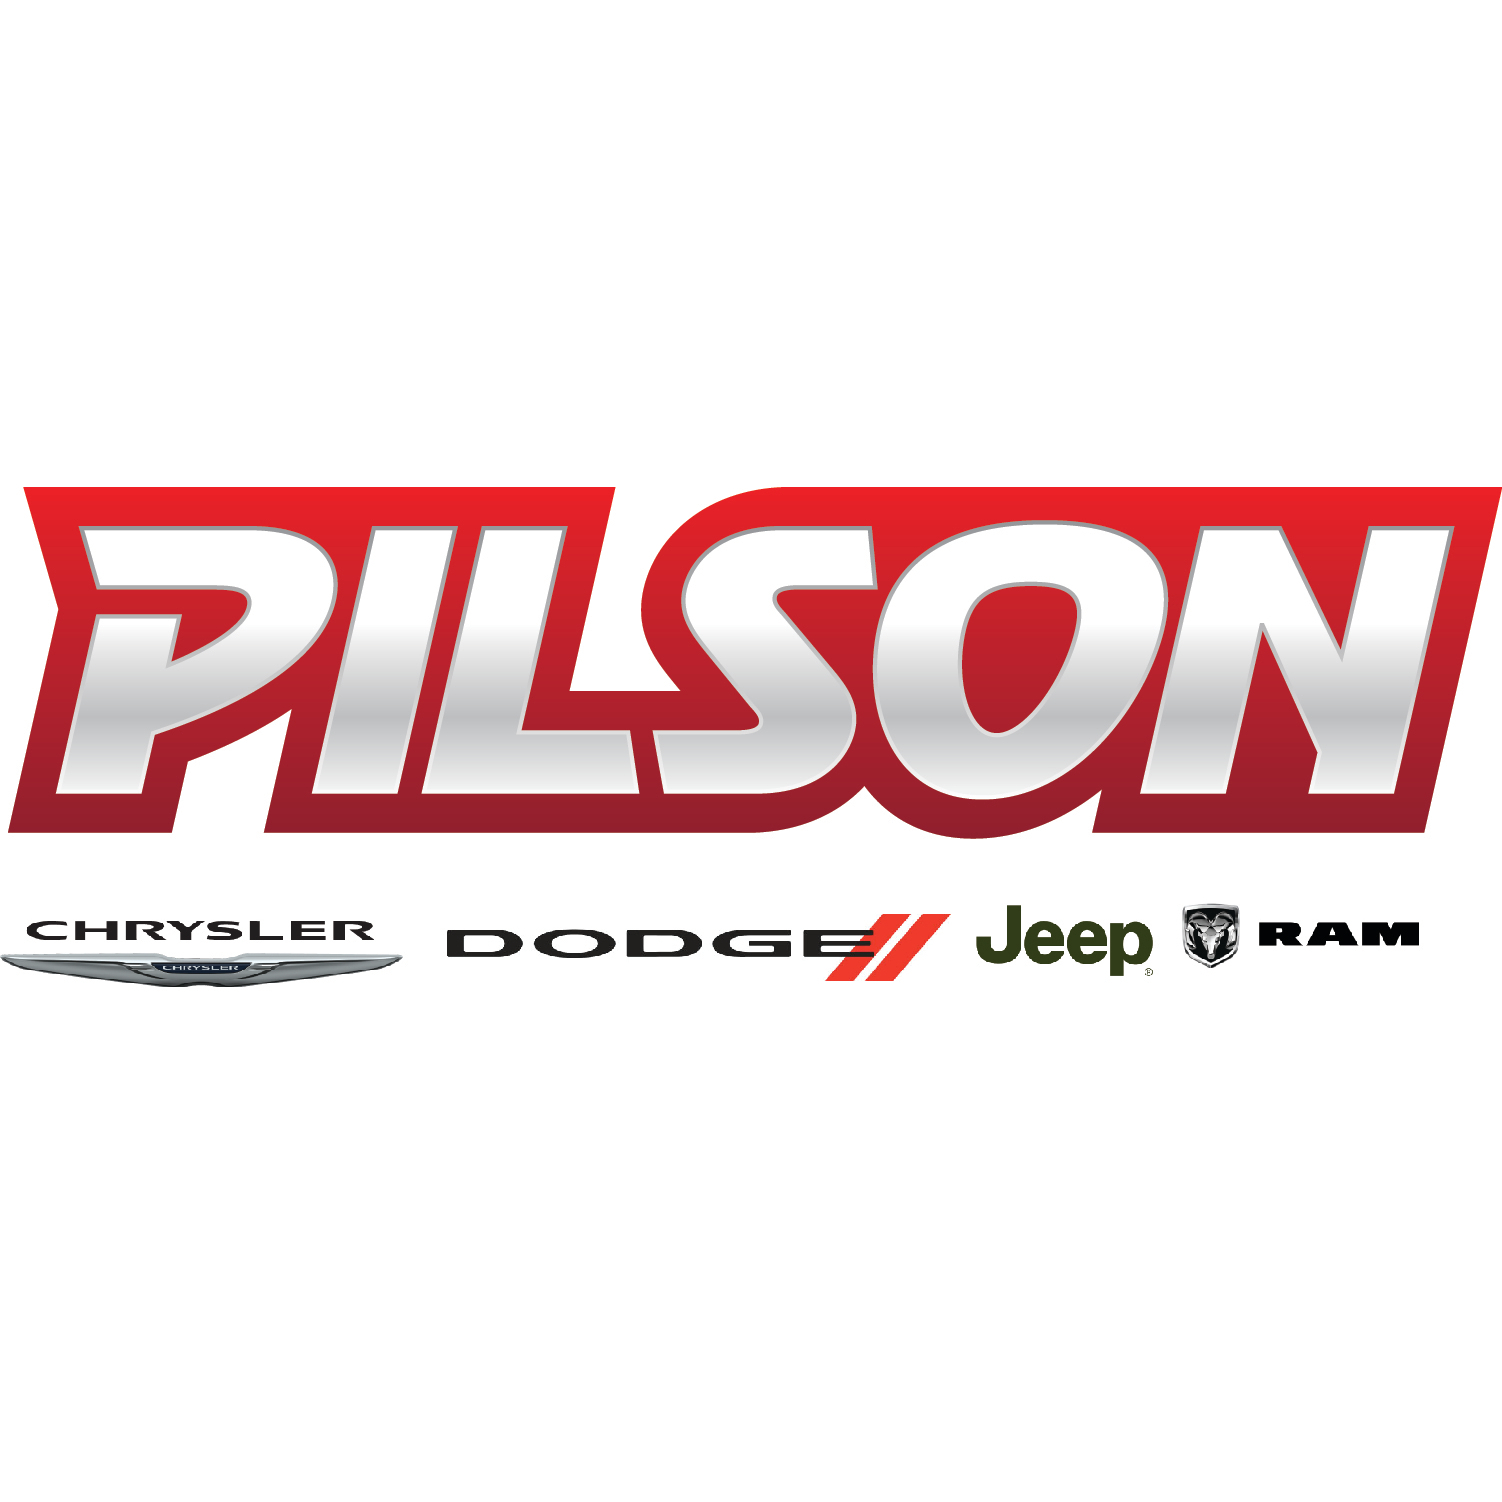 pilson chrysler jeep dodge ram 2212 lake land blvd mattoon il auto dealers mapquest. Black Bedroom Furniture Sets. Home Design Ideas